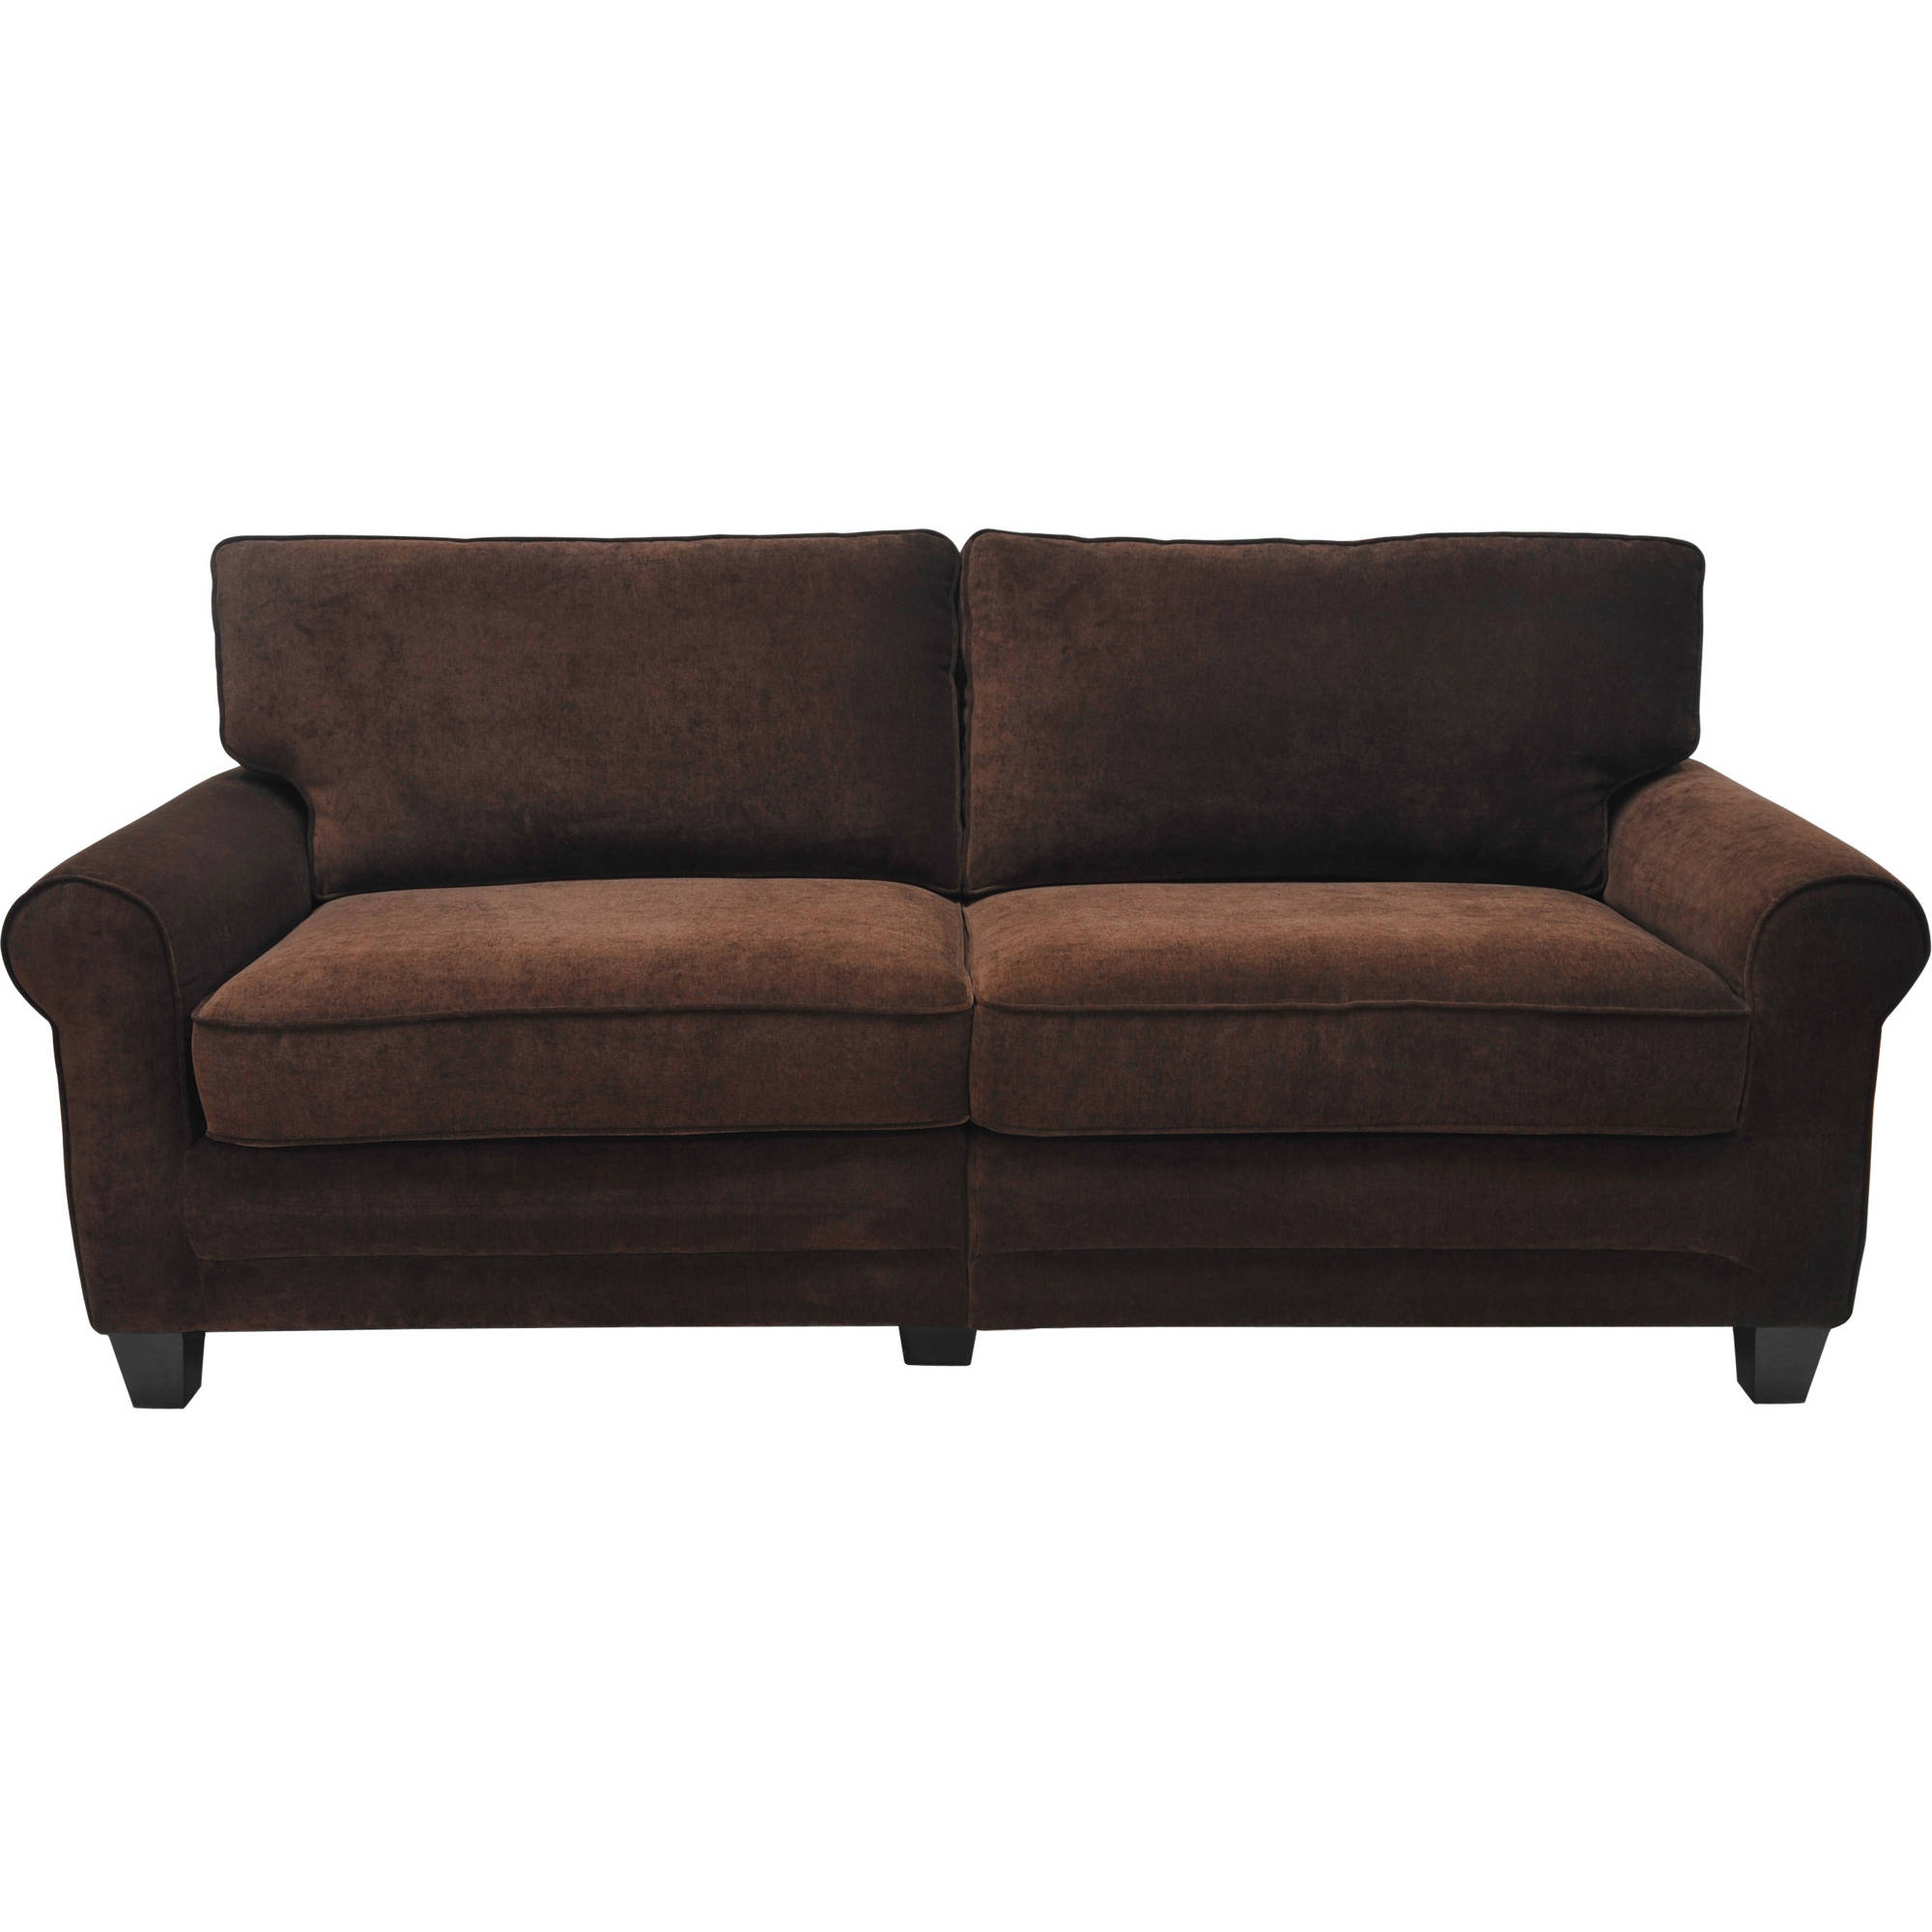 "Mansfield Graphite Velvet Sofa Chairs Inside Preferred Serta Rta Copenhagen Collection 73"" Sofa, Multiple Colors – Walmart (Gallery 11 of 20)"